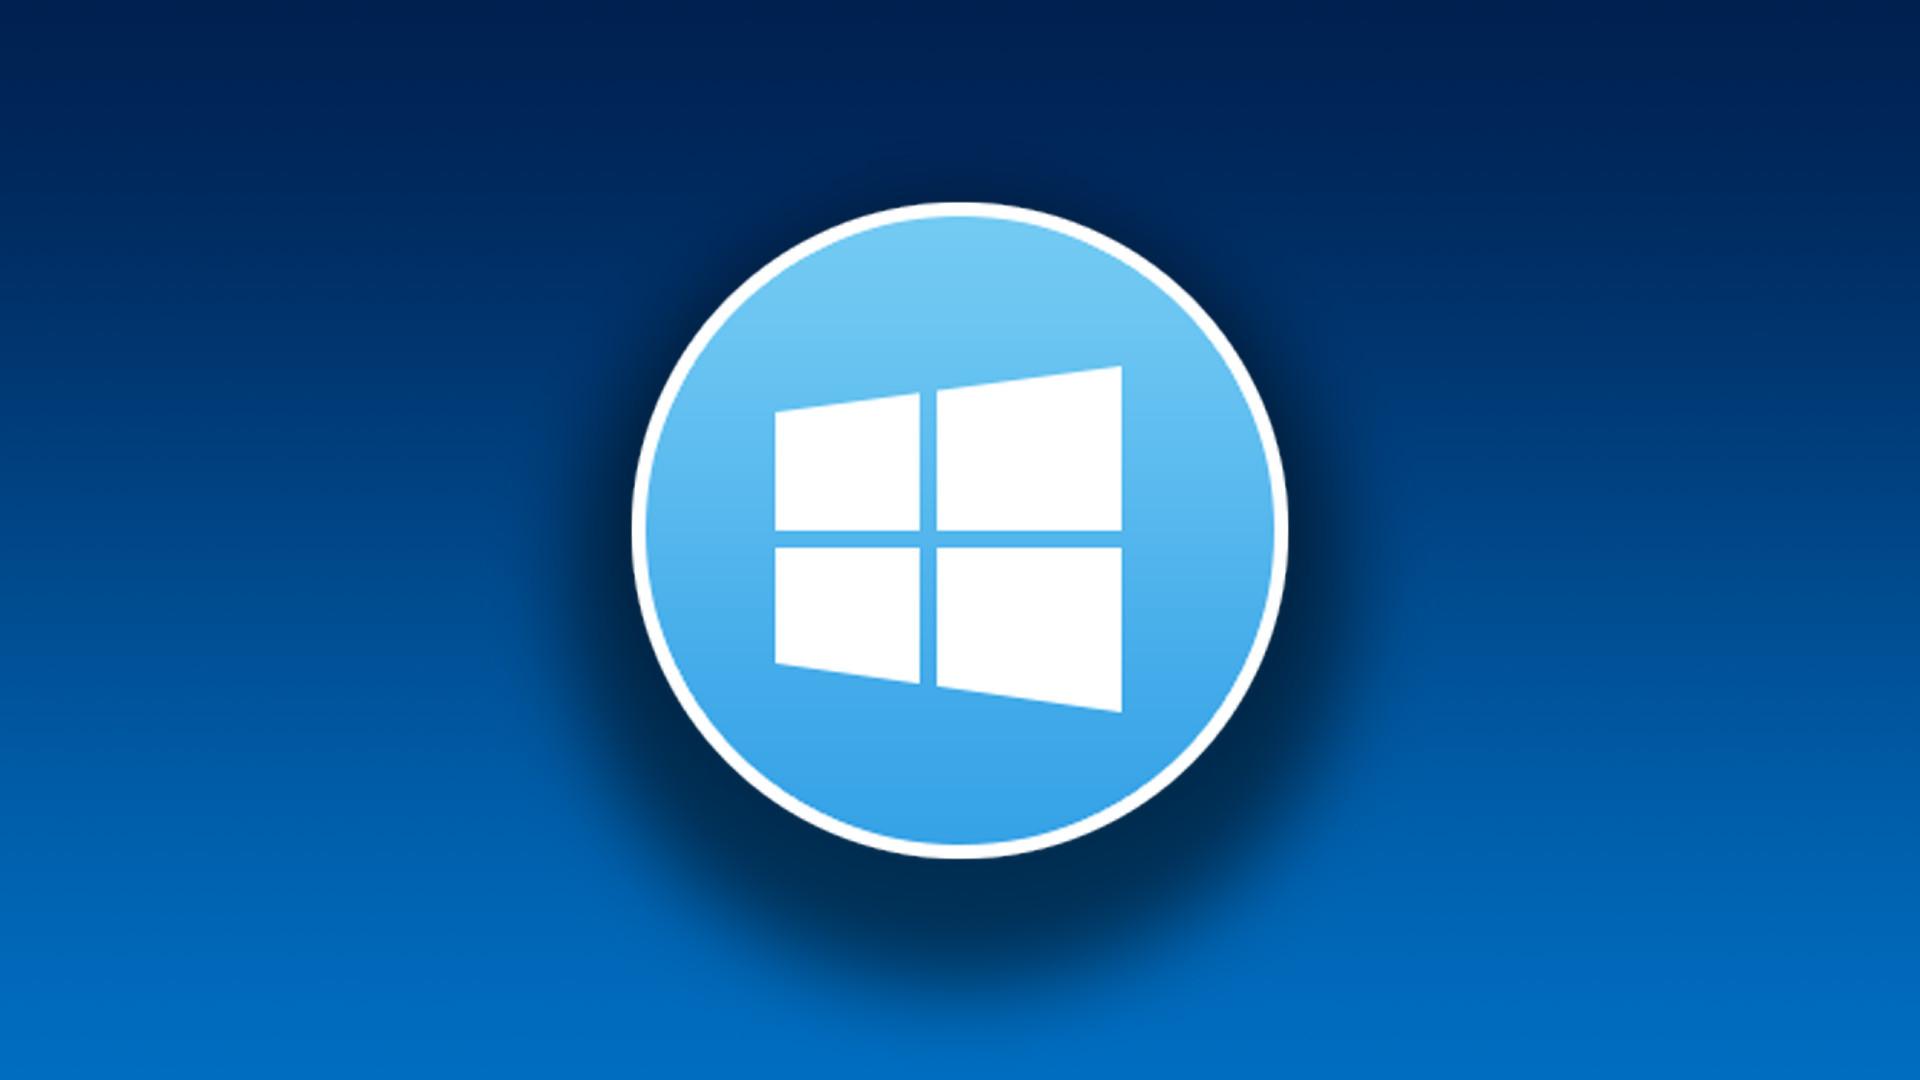 2880x1800 3d Animated Wallpaper Windows 10